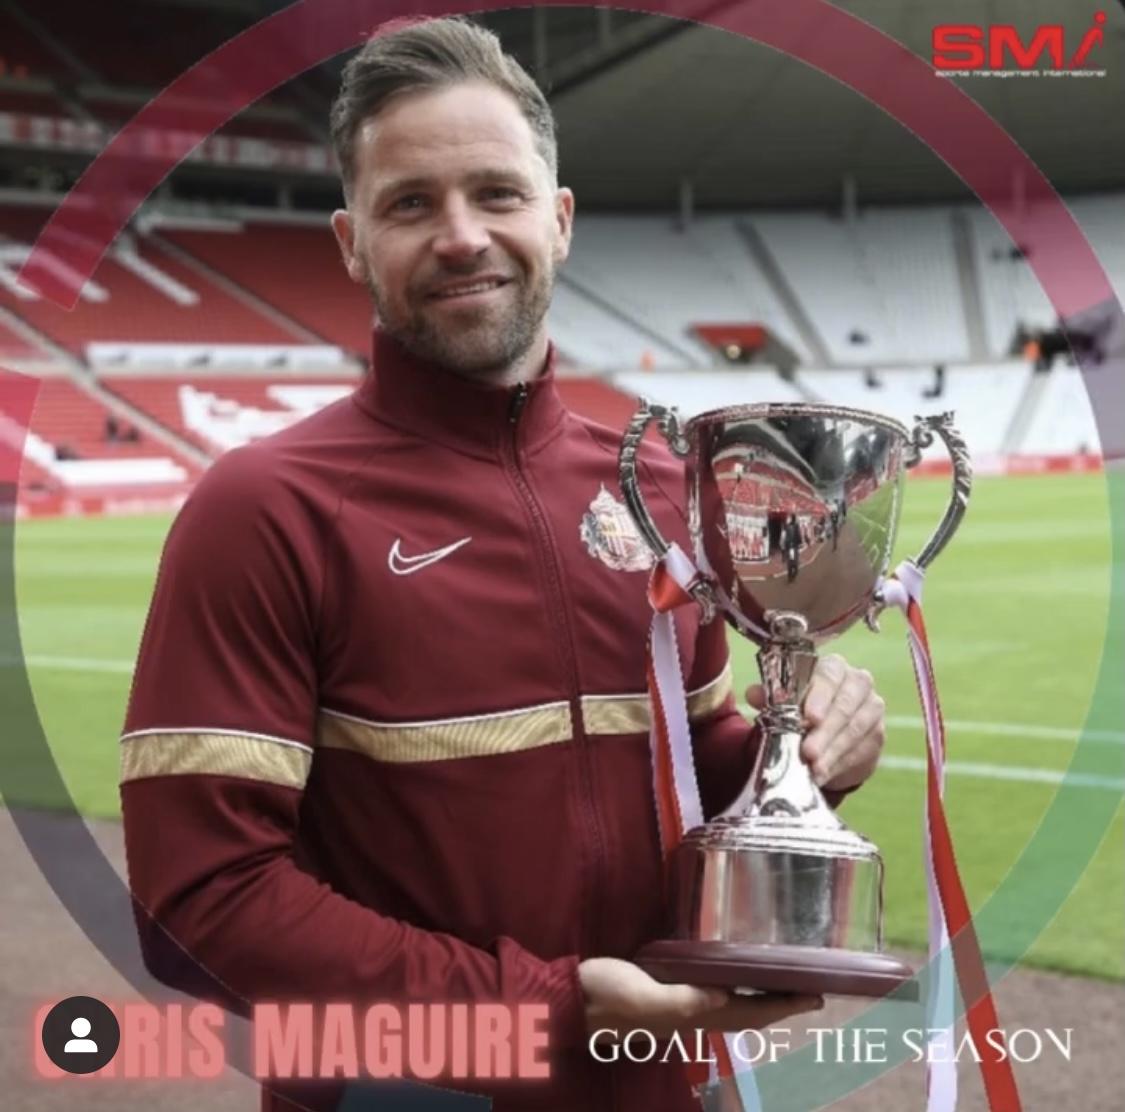 Chris Maguire goal of the season